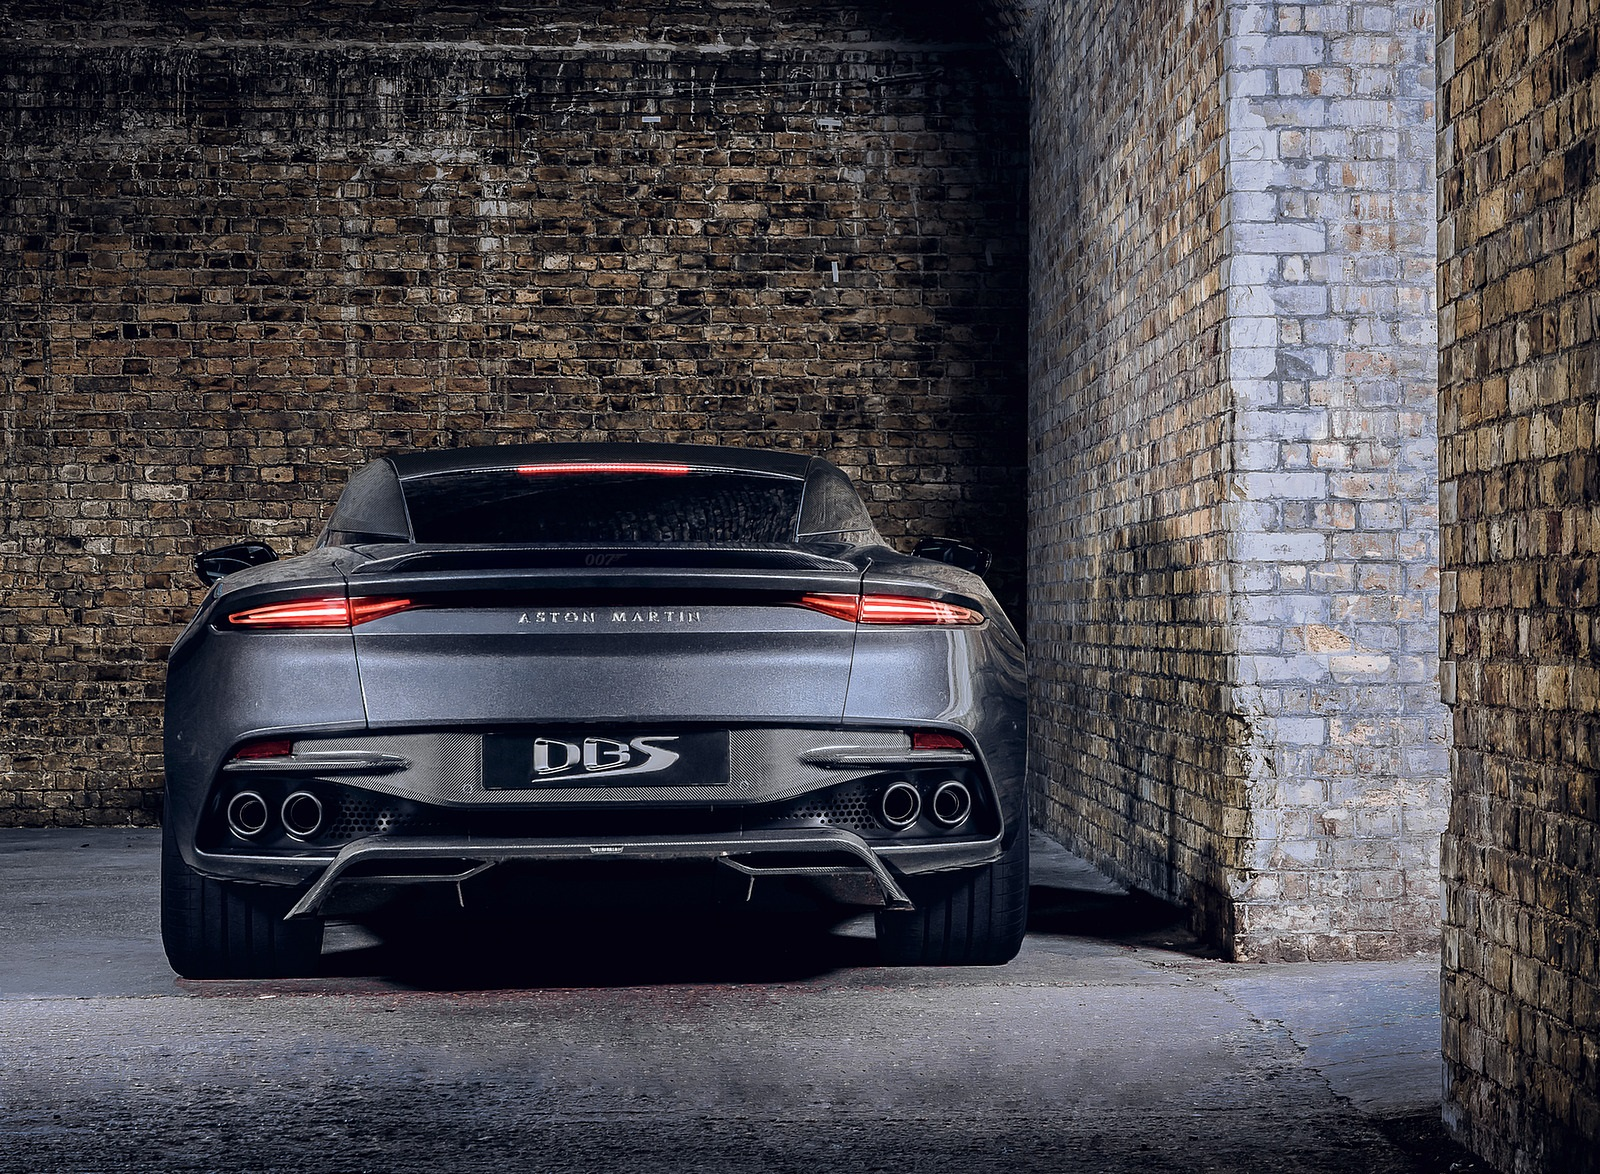 2021 Aston Martin DBS Superleggera 007 Edition Rear Wallpapers (4)